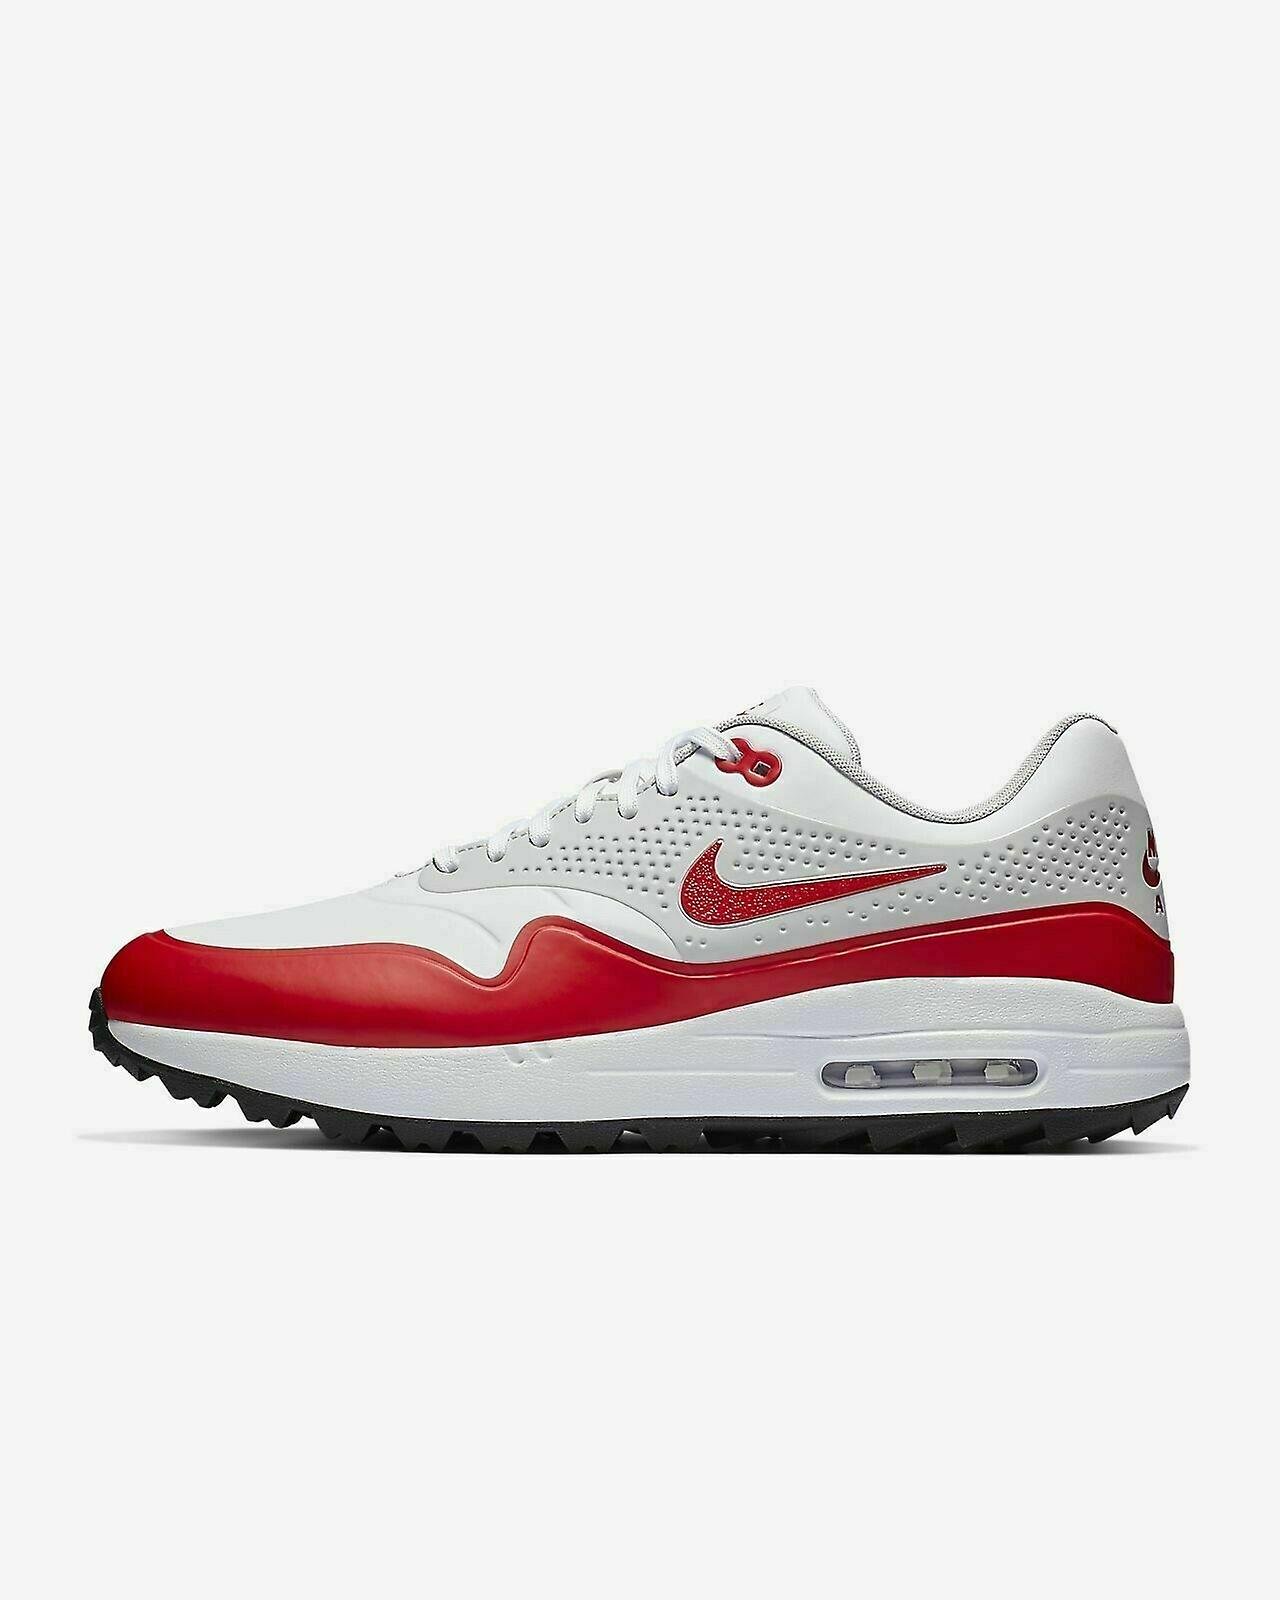 Nike Air Max 1 G AQ0863 100 Herren Golfschuhe